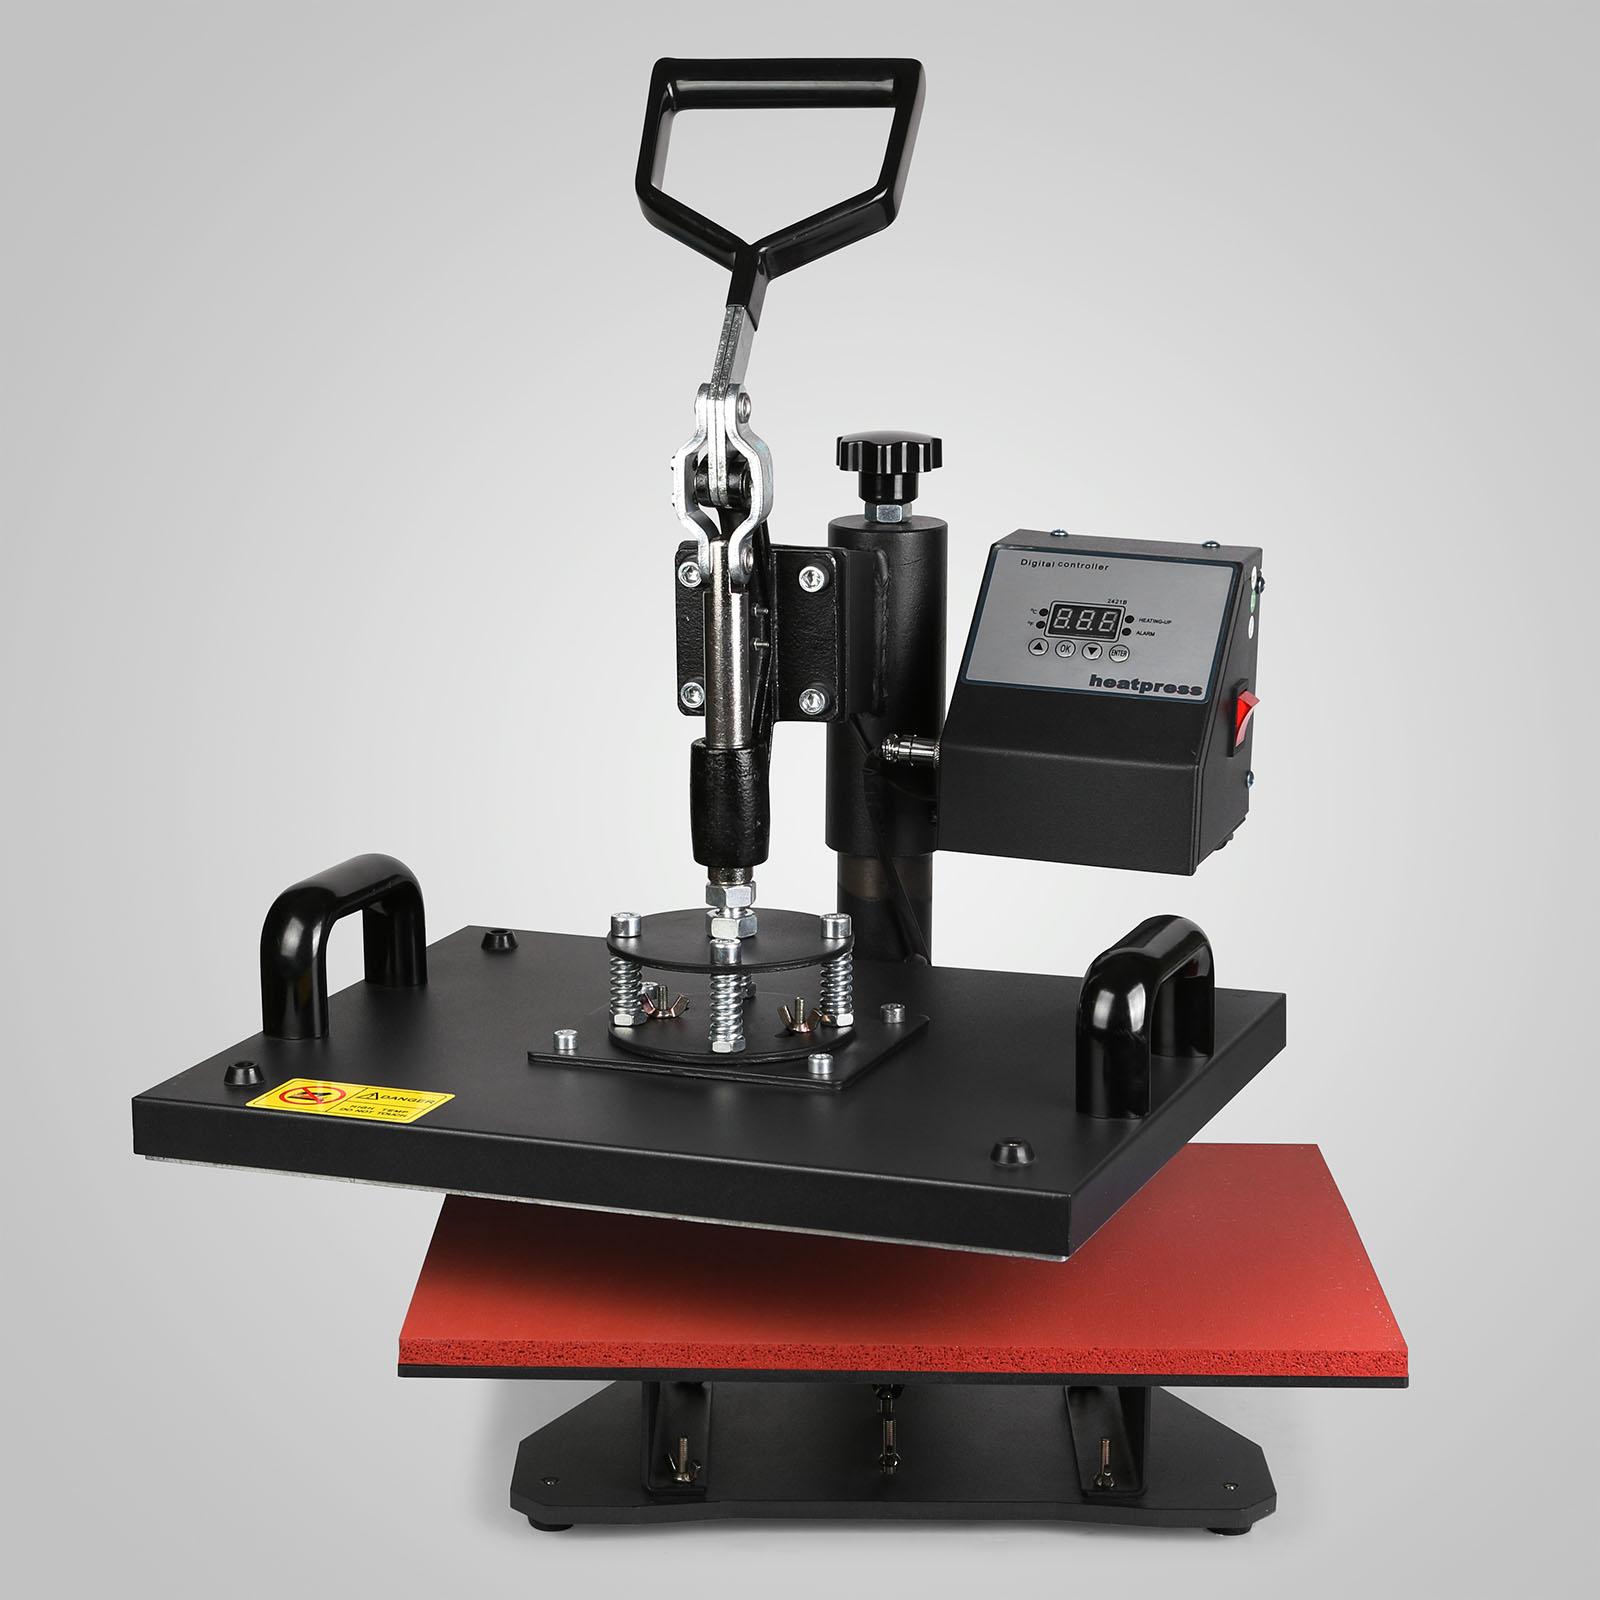 5in1 heat press transfer vinyl cutting plotter t shirt machine digital sticker. Black Bedroom Furniture Sets. Home Design Ideas